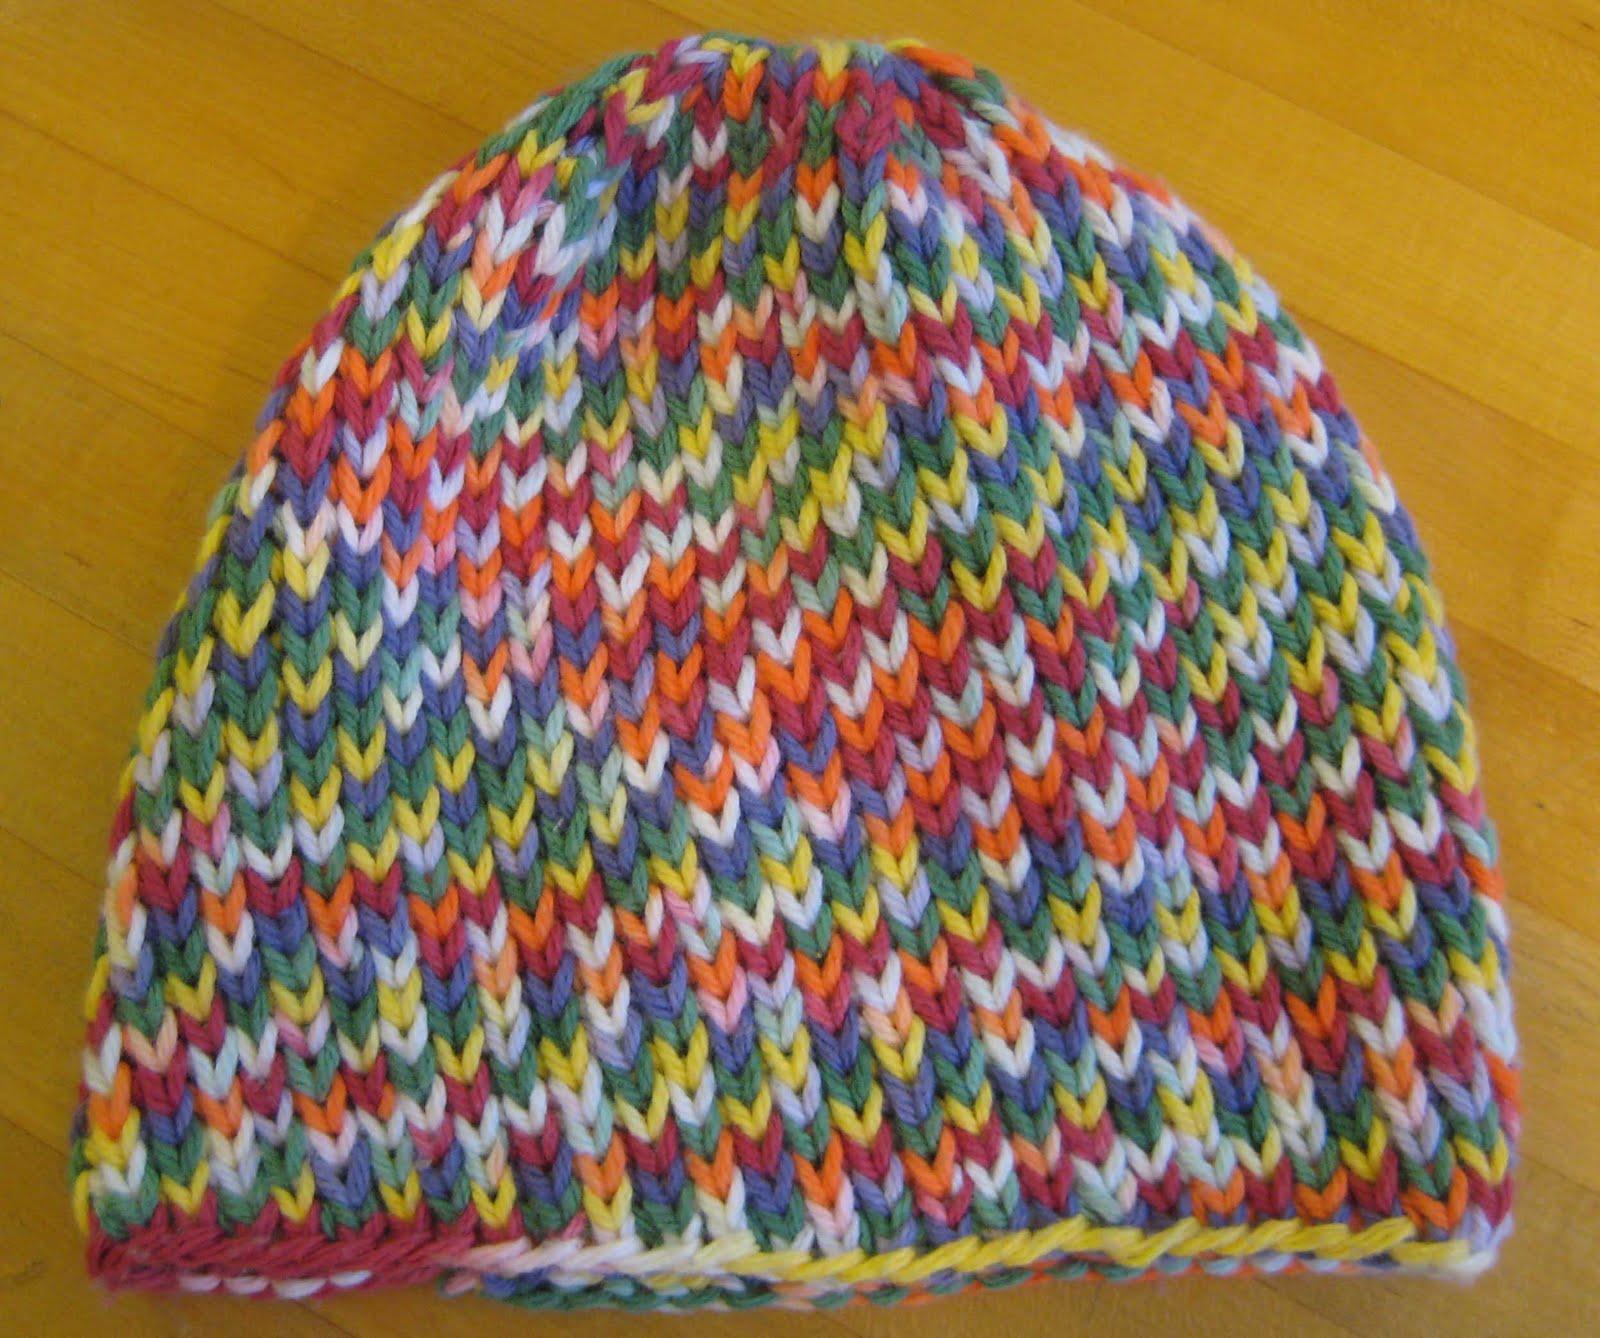 Hat Pattern Straight Needles - Patterns Gallery